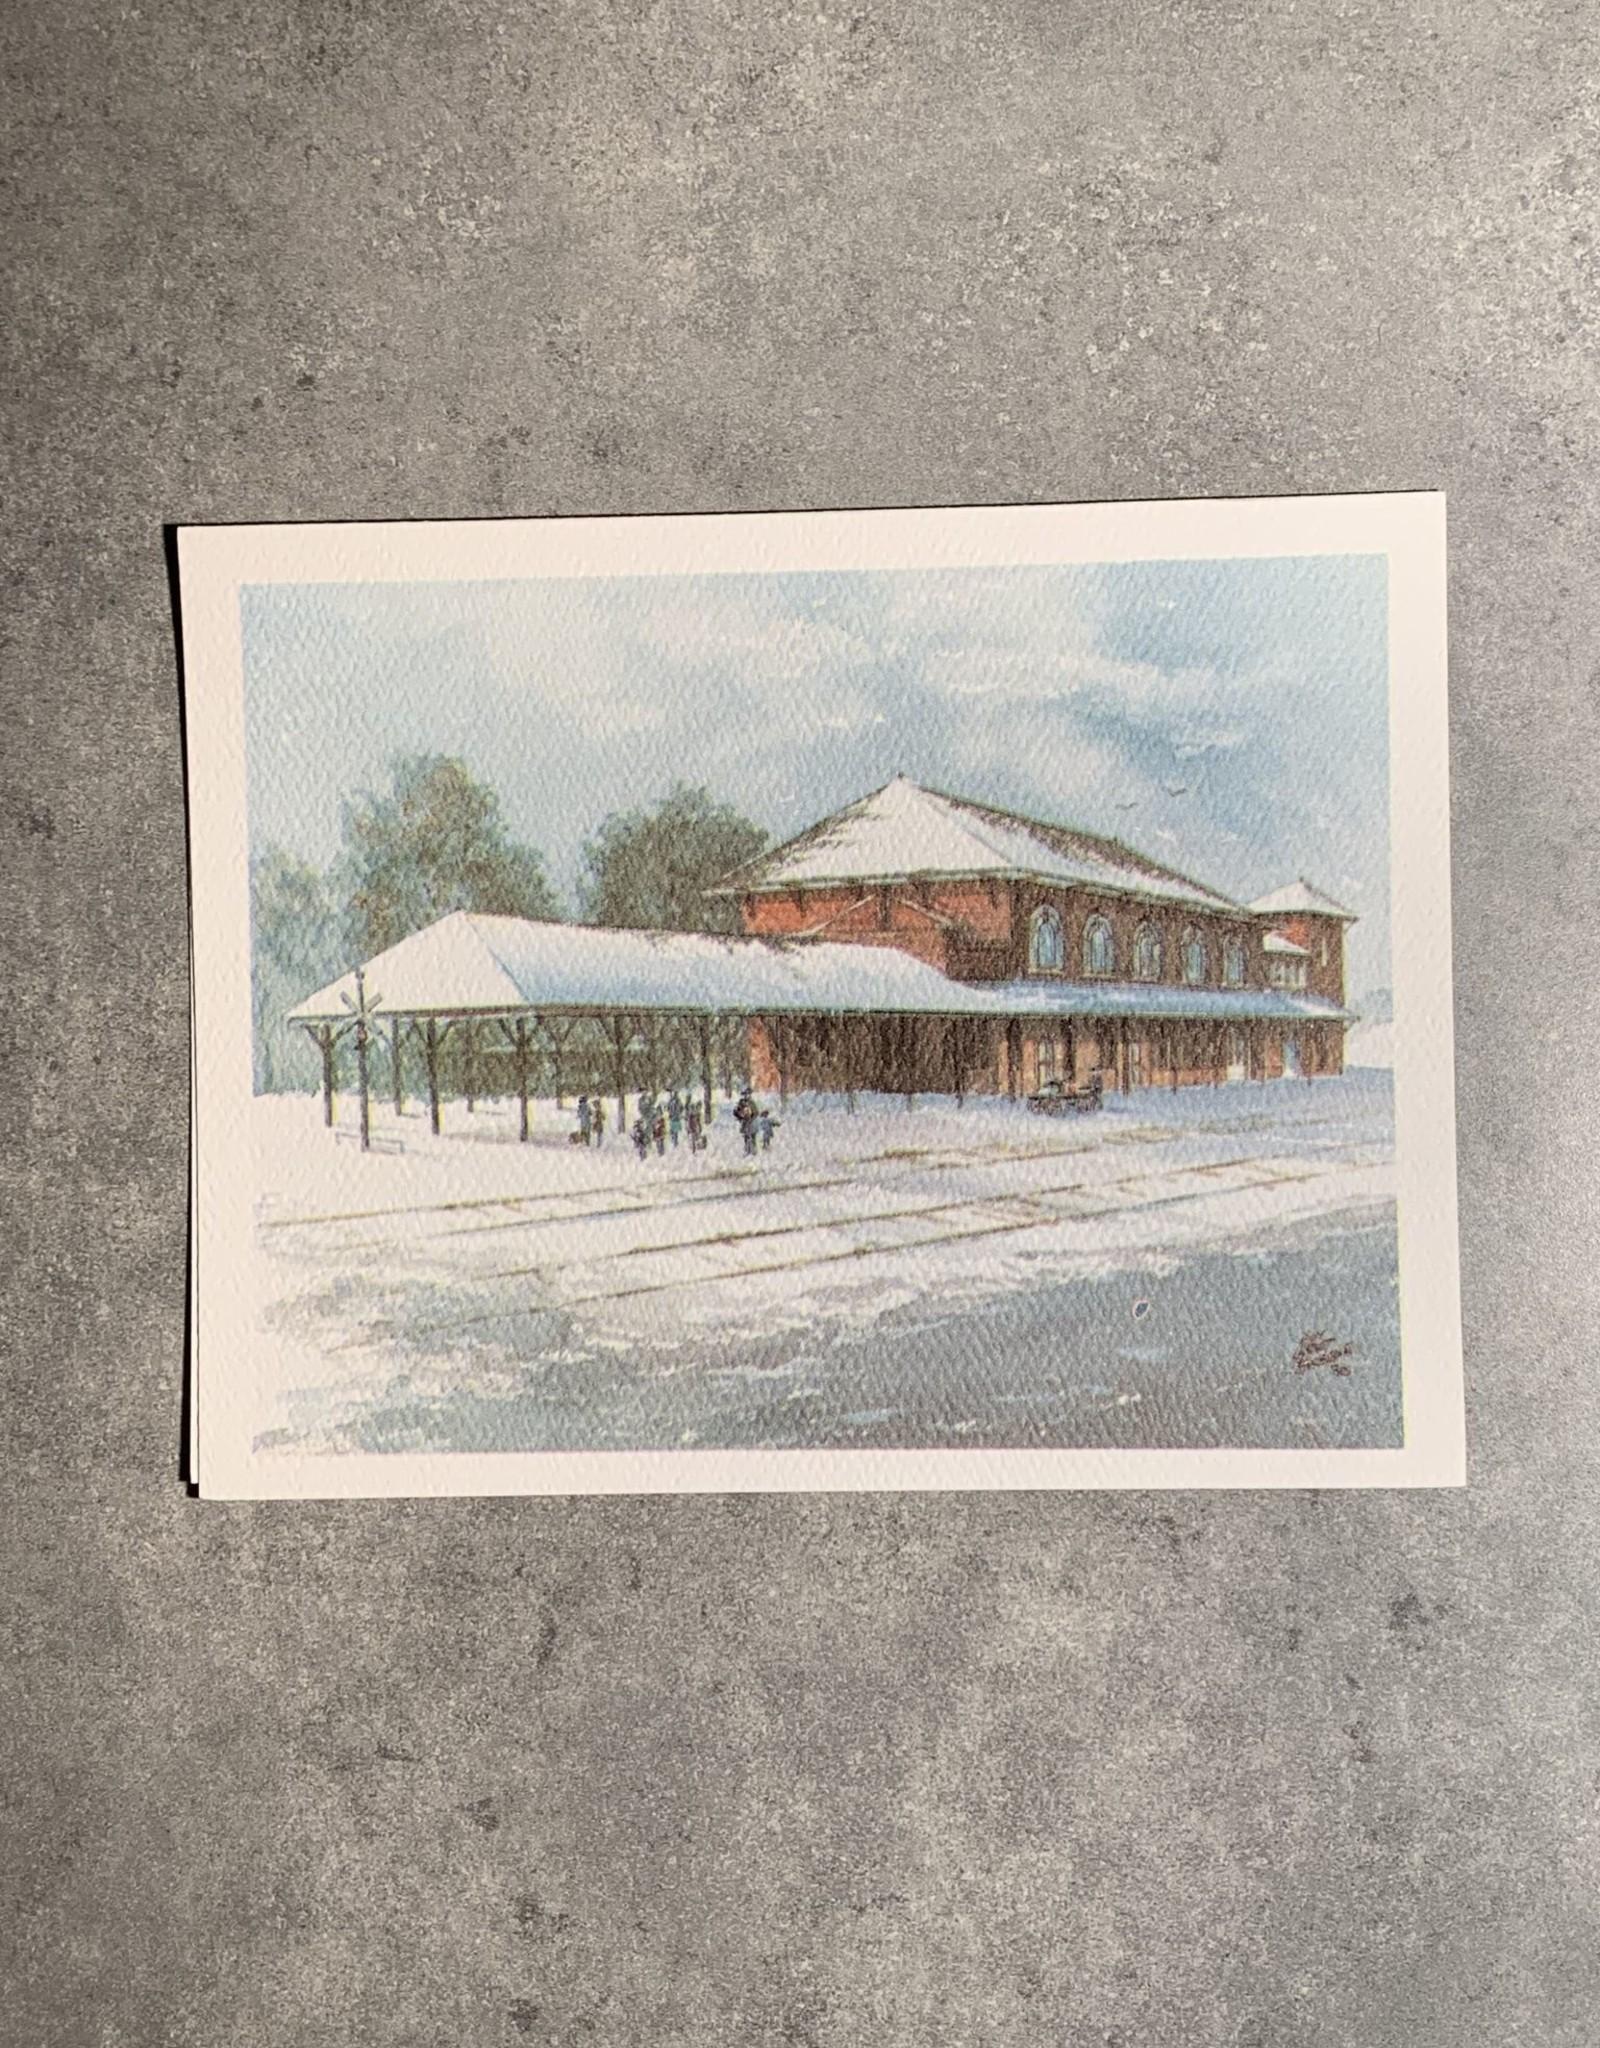 UA Merch Peoria Note Card by Mort Greene River Station Rock Island Depot